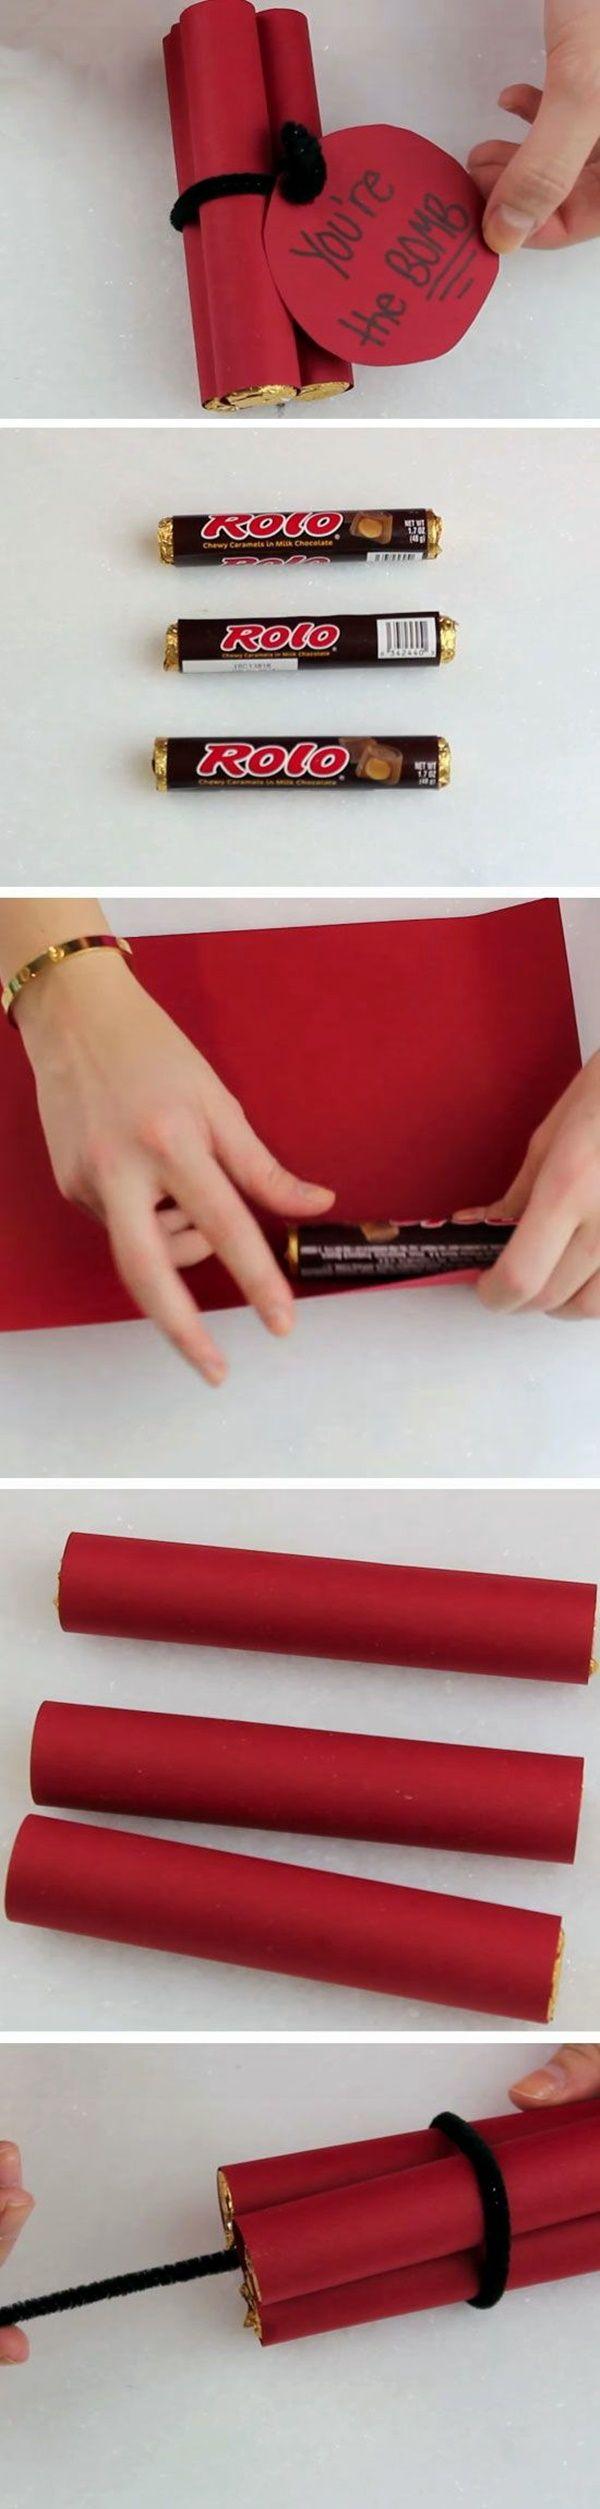 httpss media cache ak0pinimgcom736x6bfbbf - Cute Valentines Ideas For Him